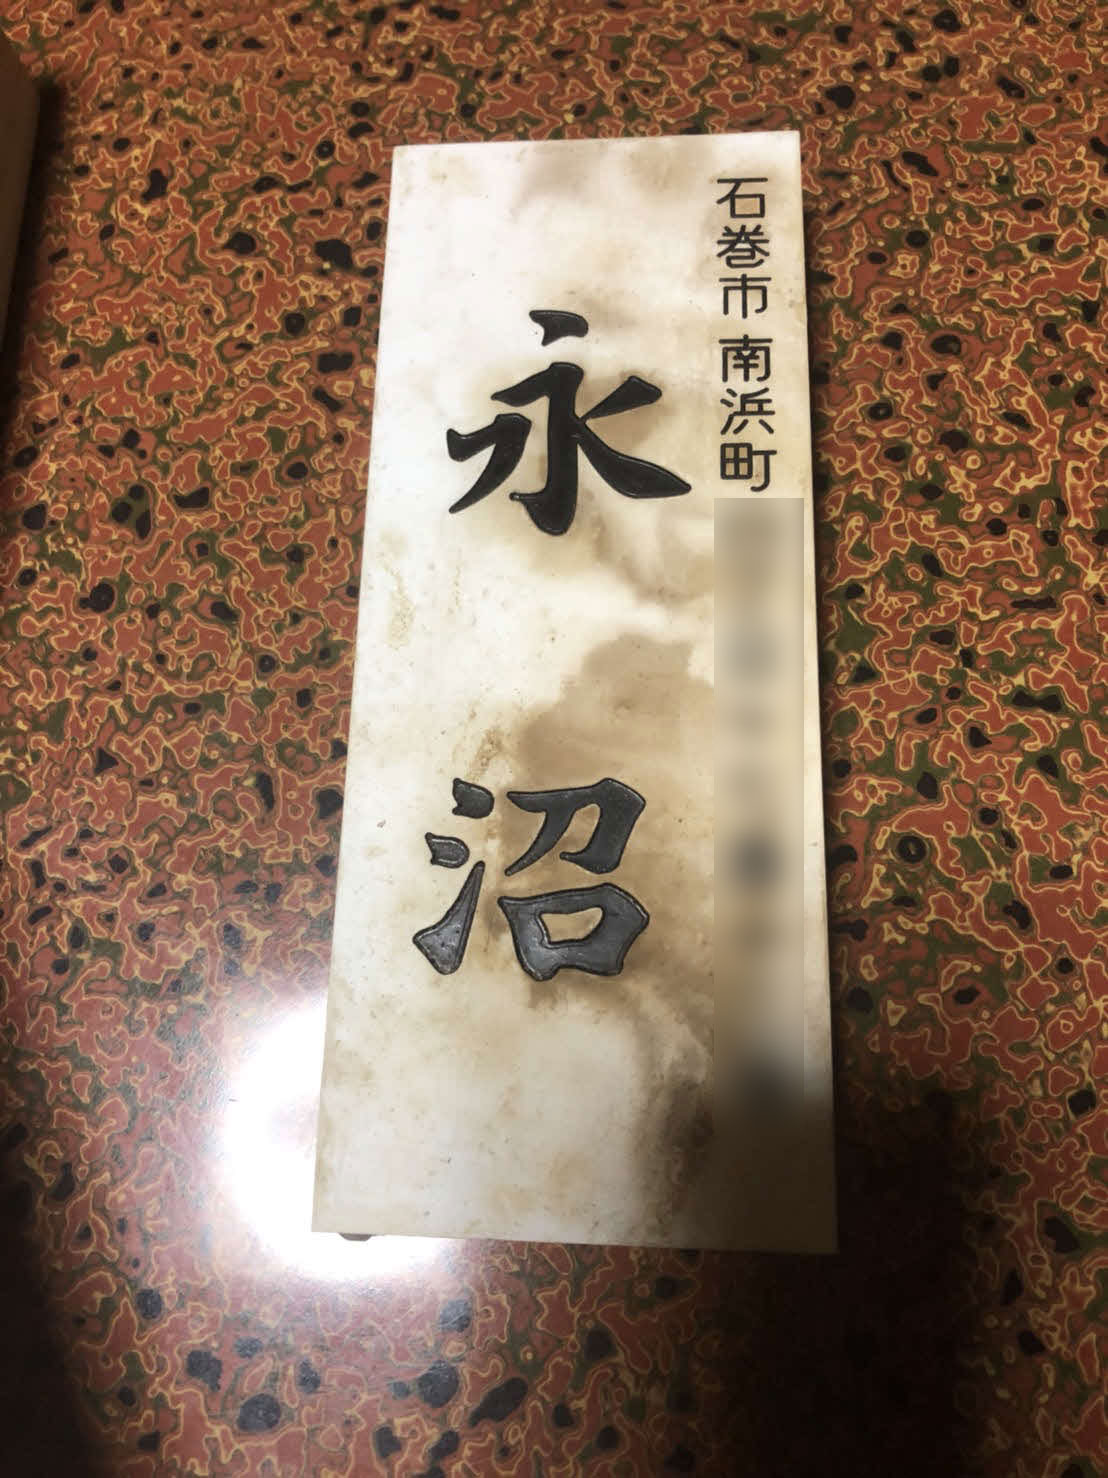 J1仙台永沼慎也主務の実家の表札